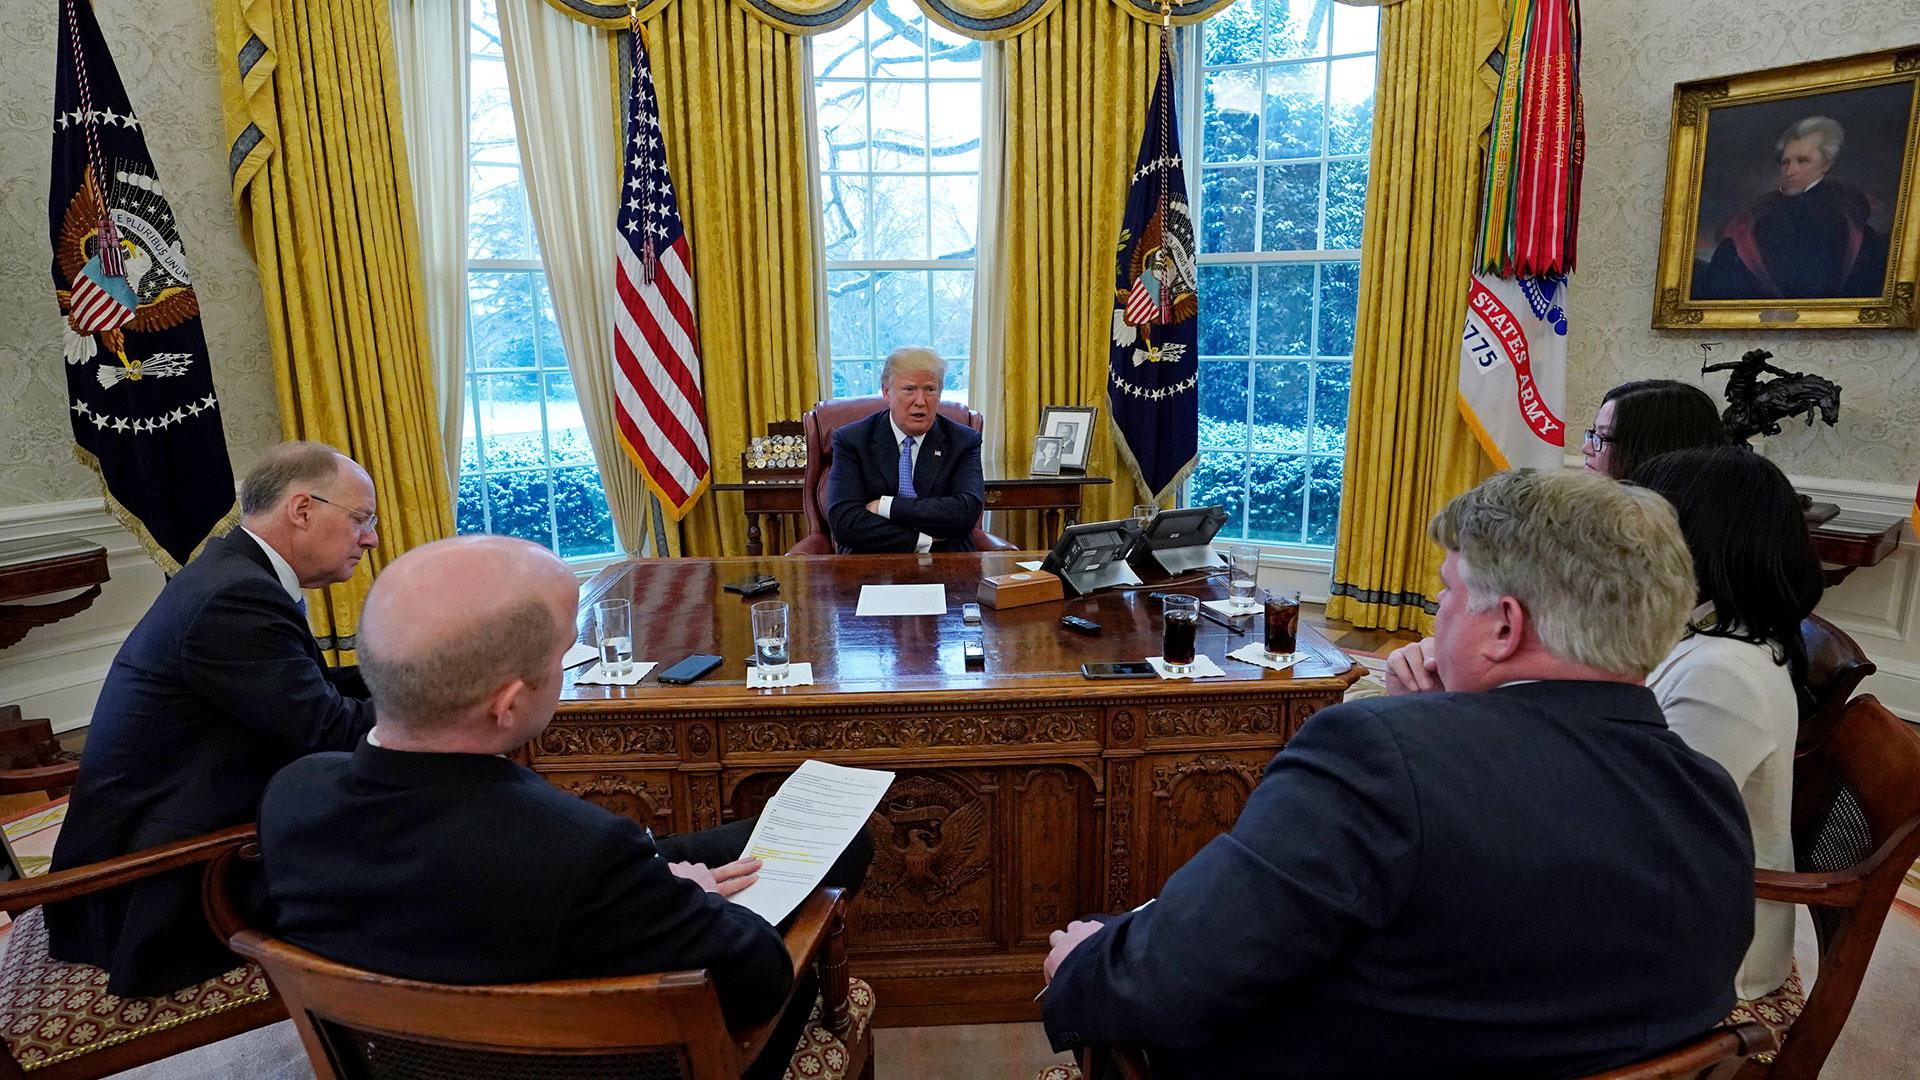 El equipo de Reuters durante la entrevista a Donald Trump